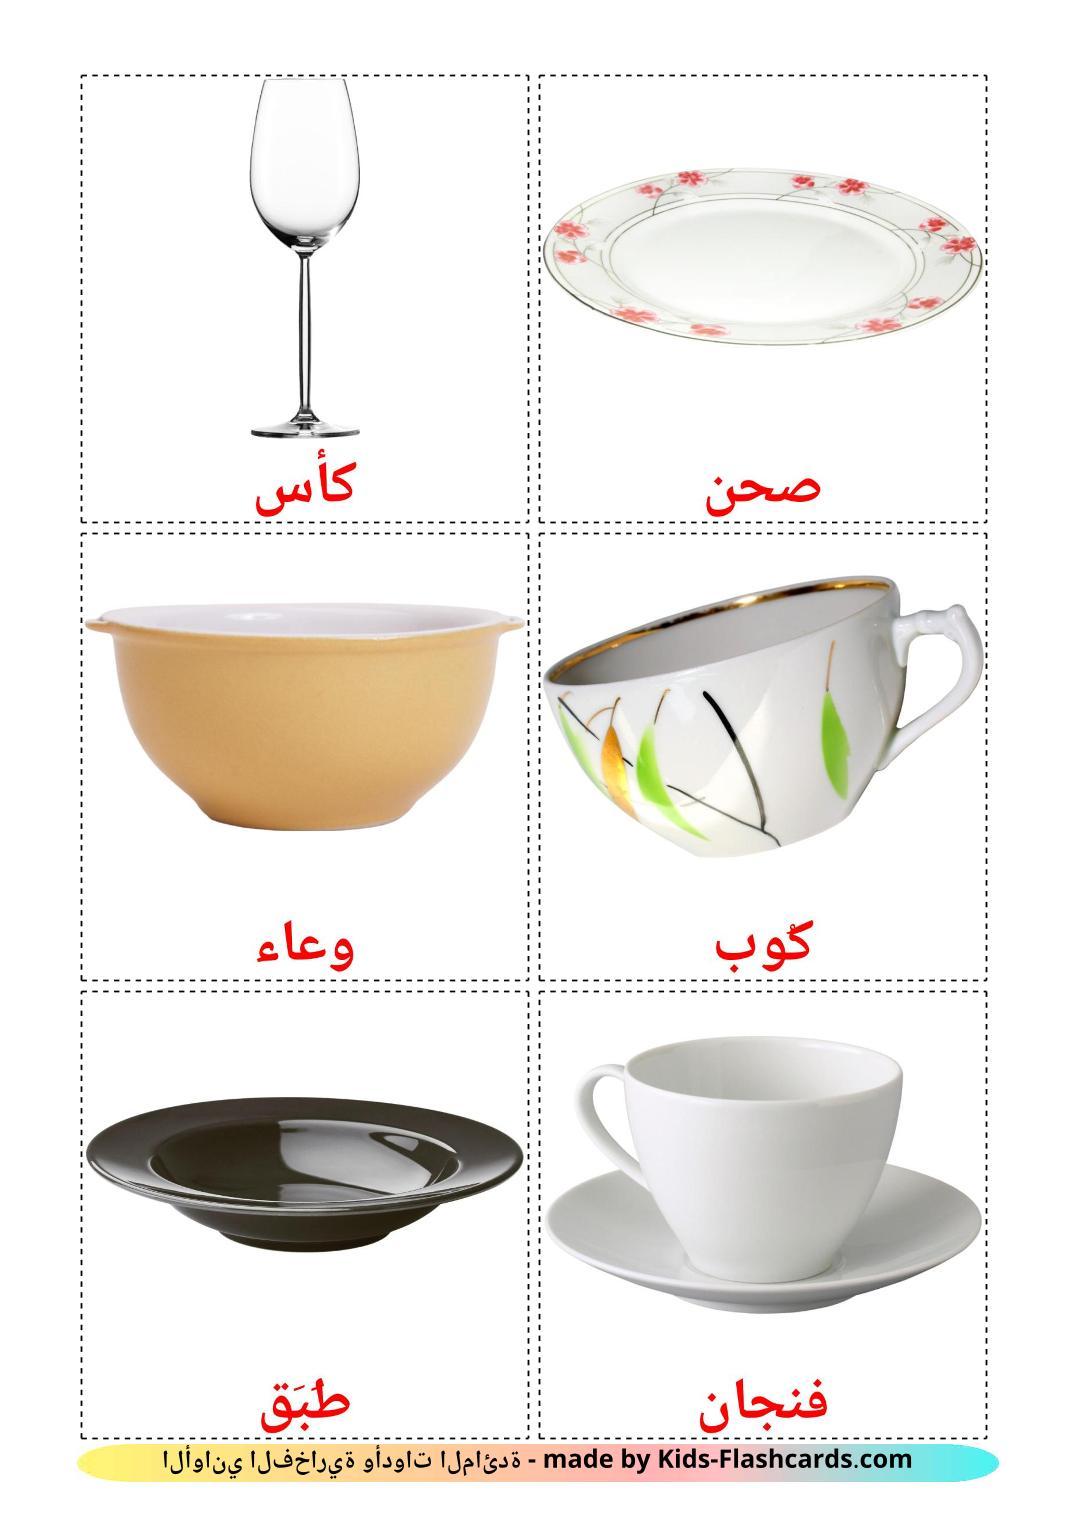 Crockery and cutlery - 29 Free Printable arabic Flashcards